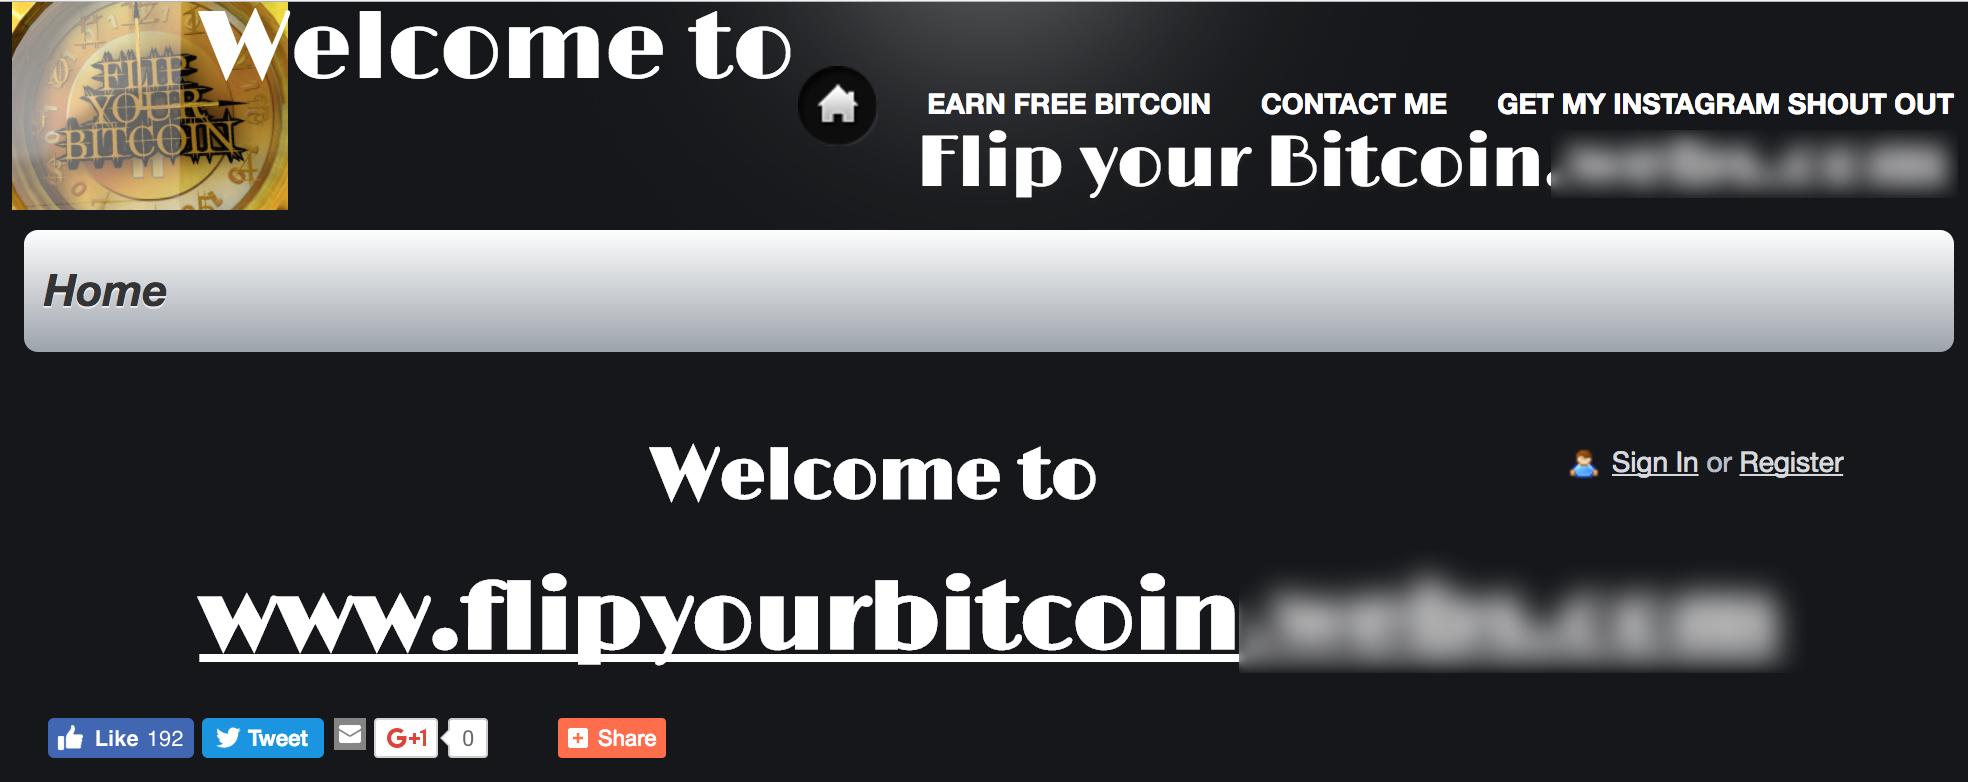 Bitcoin Scams on Social Media: The Dark Side of Digital